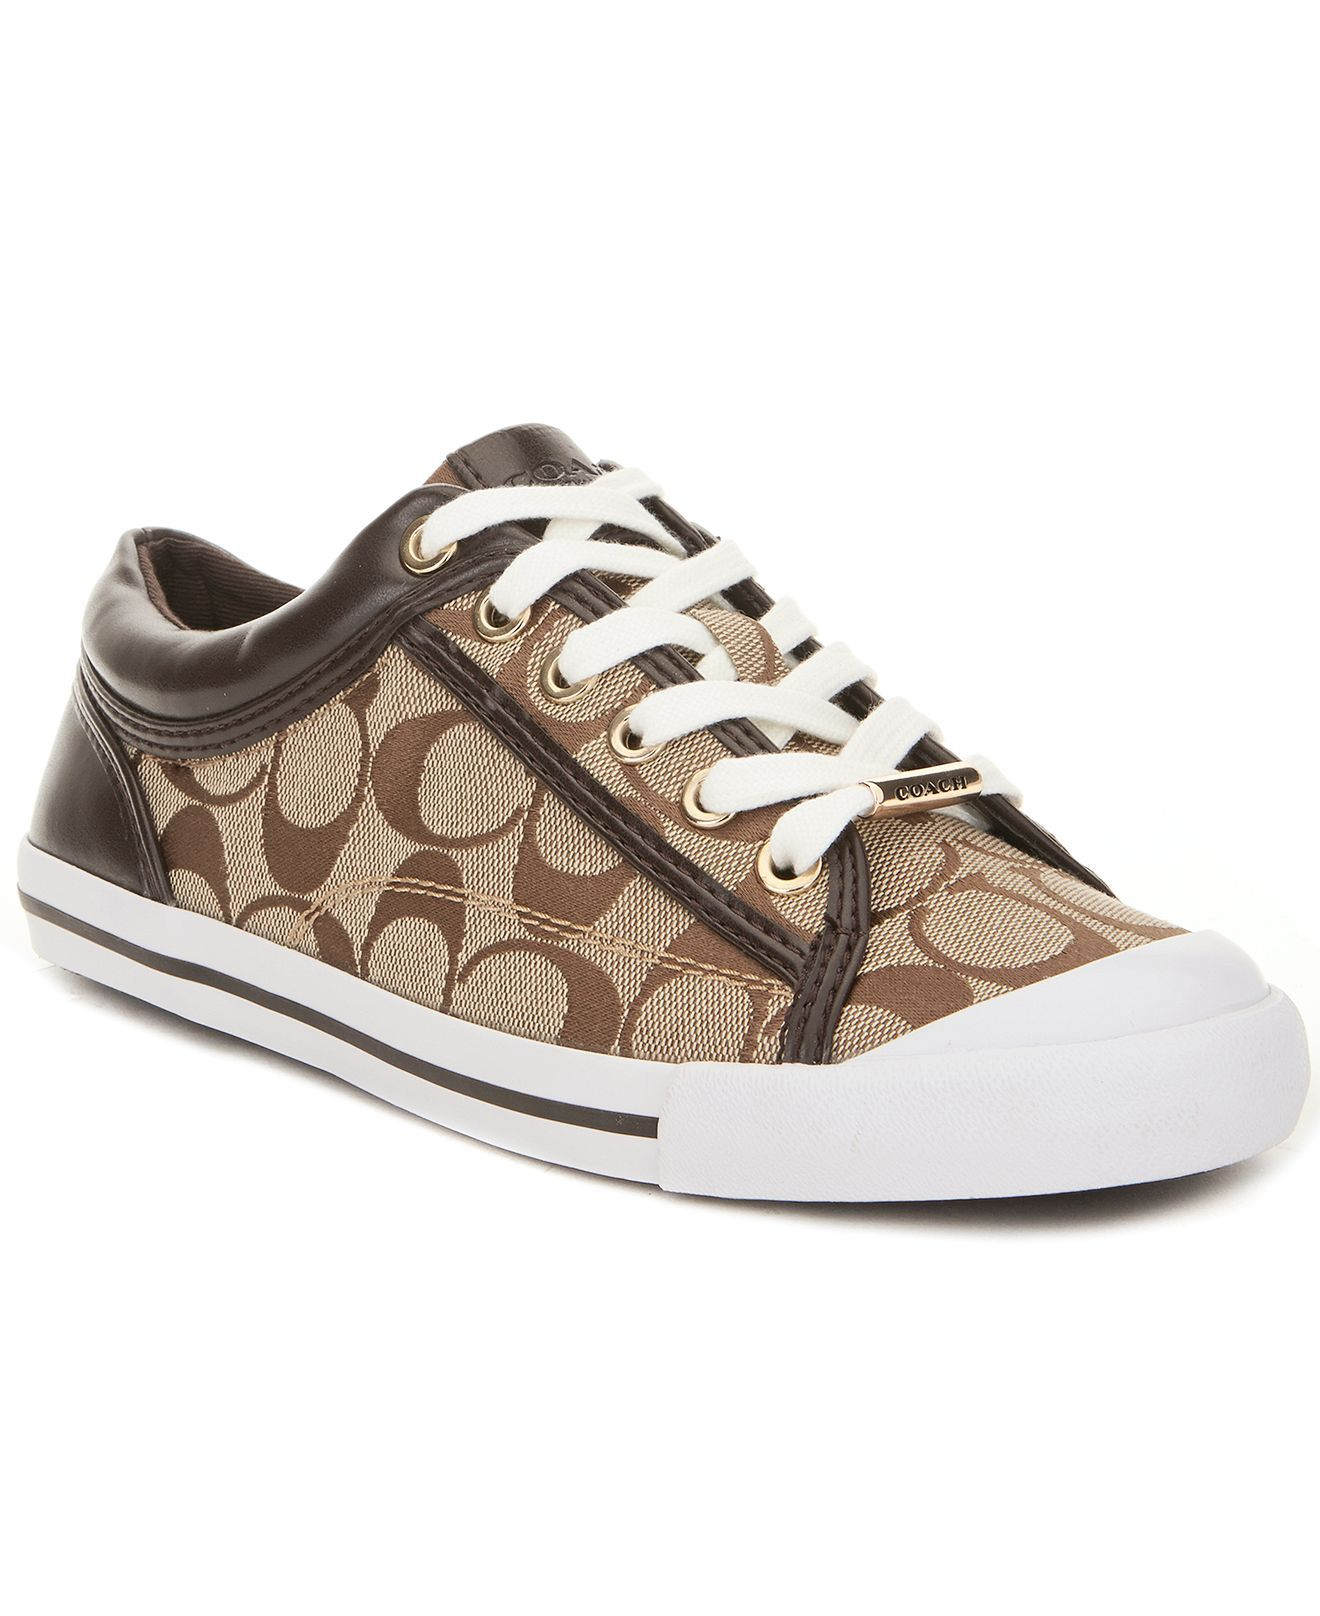 be8148bfc3d COACH FRANCESCA SNEAKER - Coach Shoes - Handbags   Accessories - Macy s